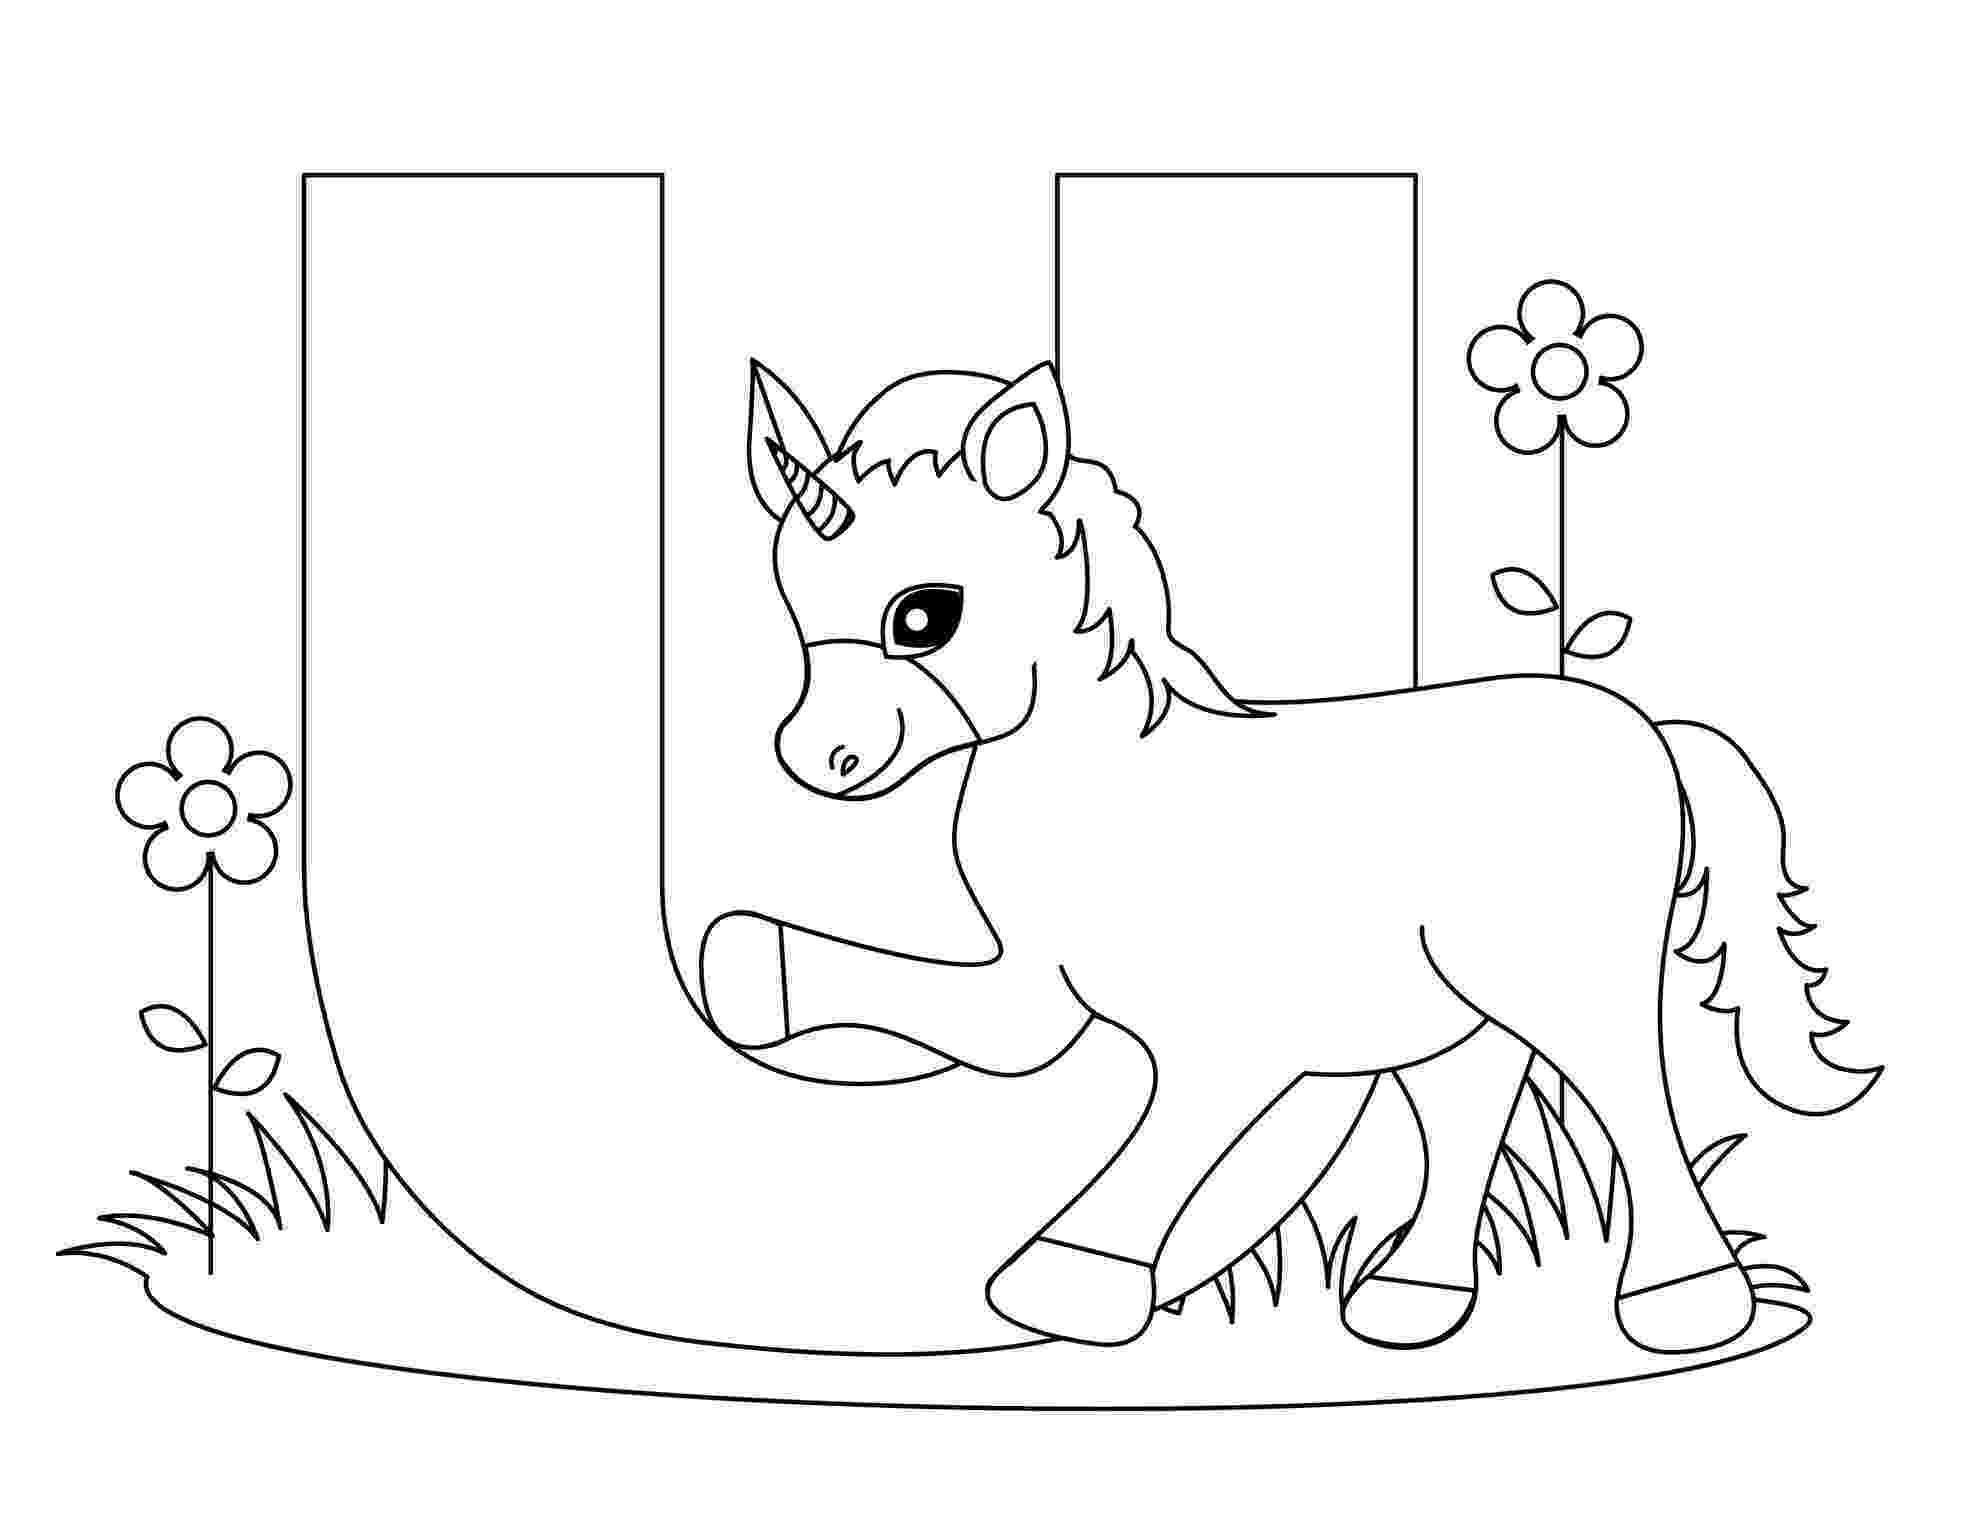 alphabet coloring free printable alphabet coloring pages for kids best alphabet coloring 1 4